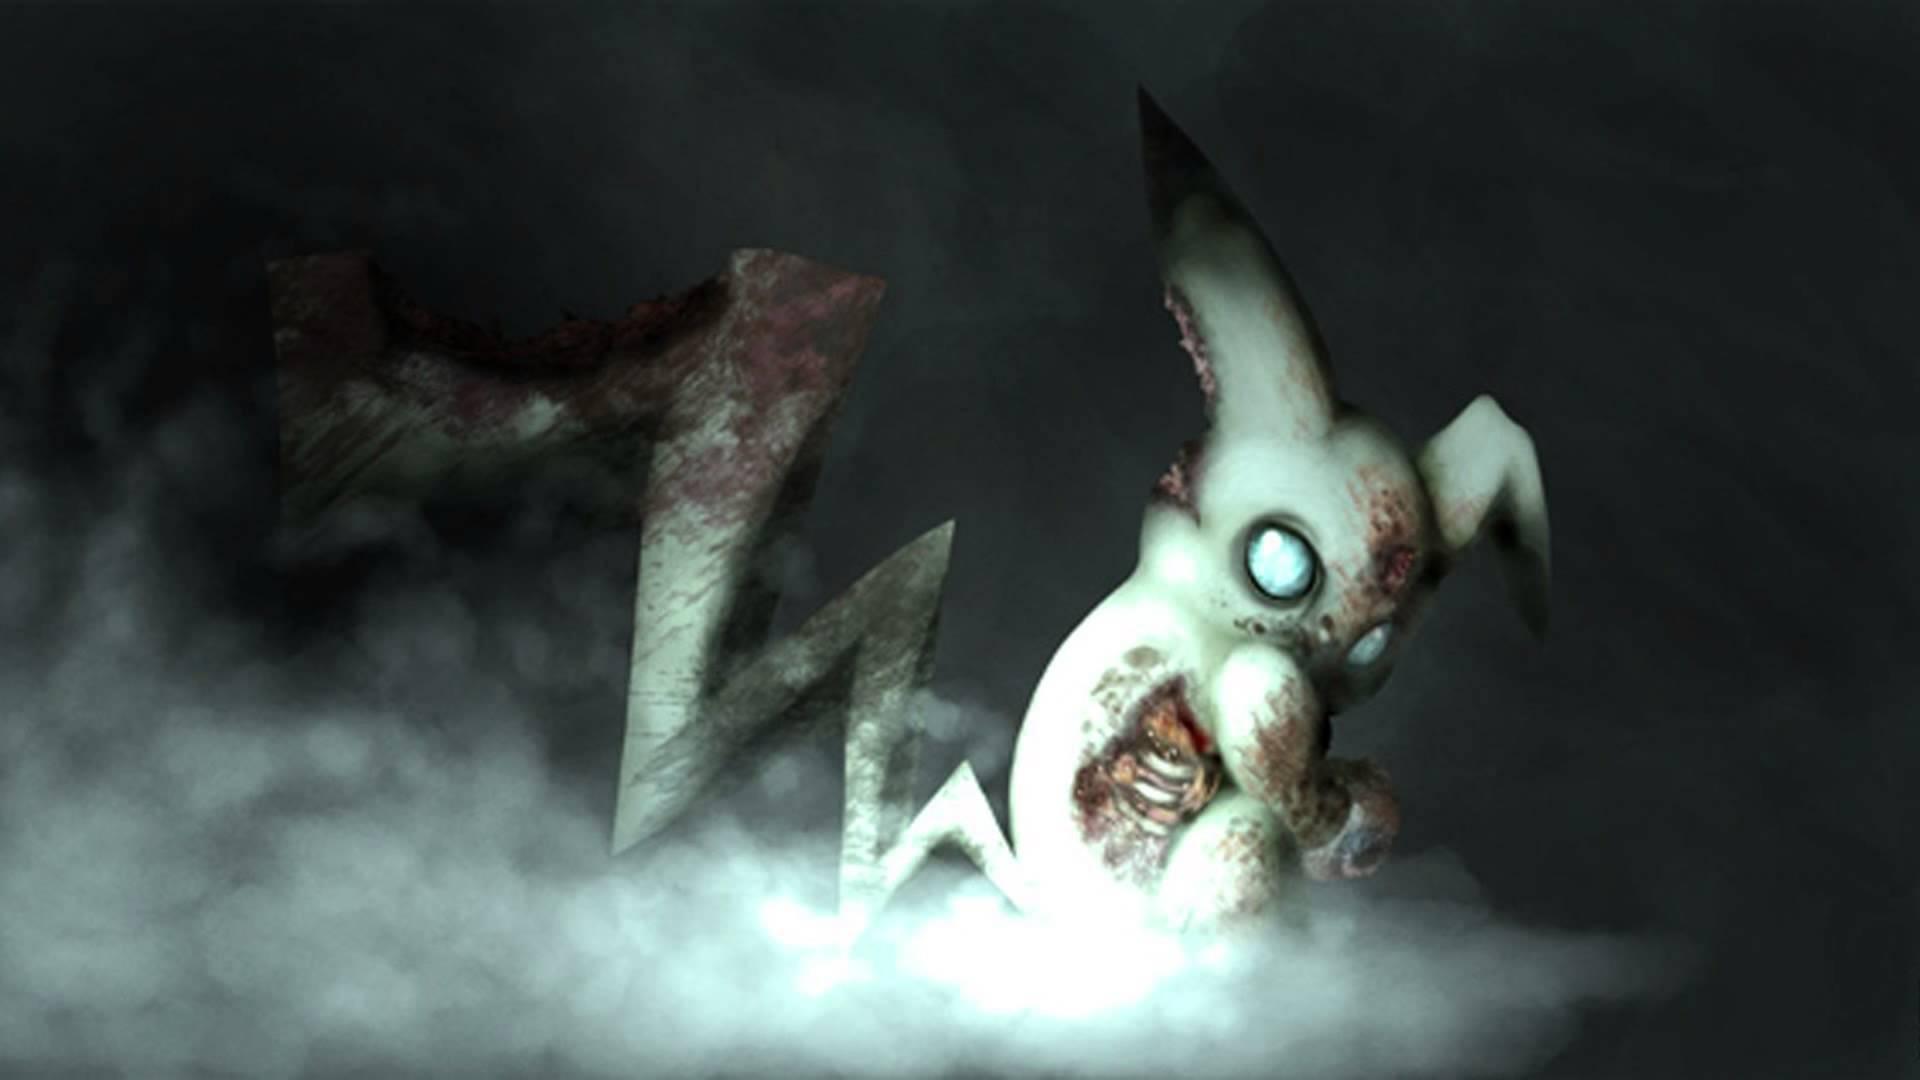 E se os Pokémons existissem na vida real? Confira o aspecto de 30 deles agora!